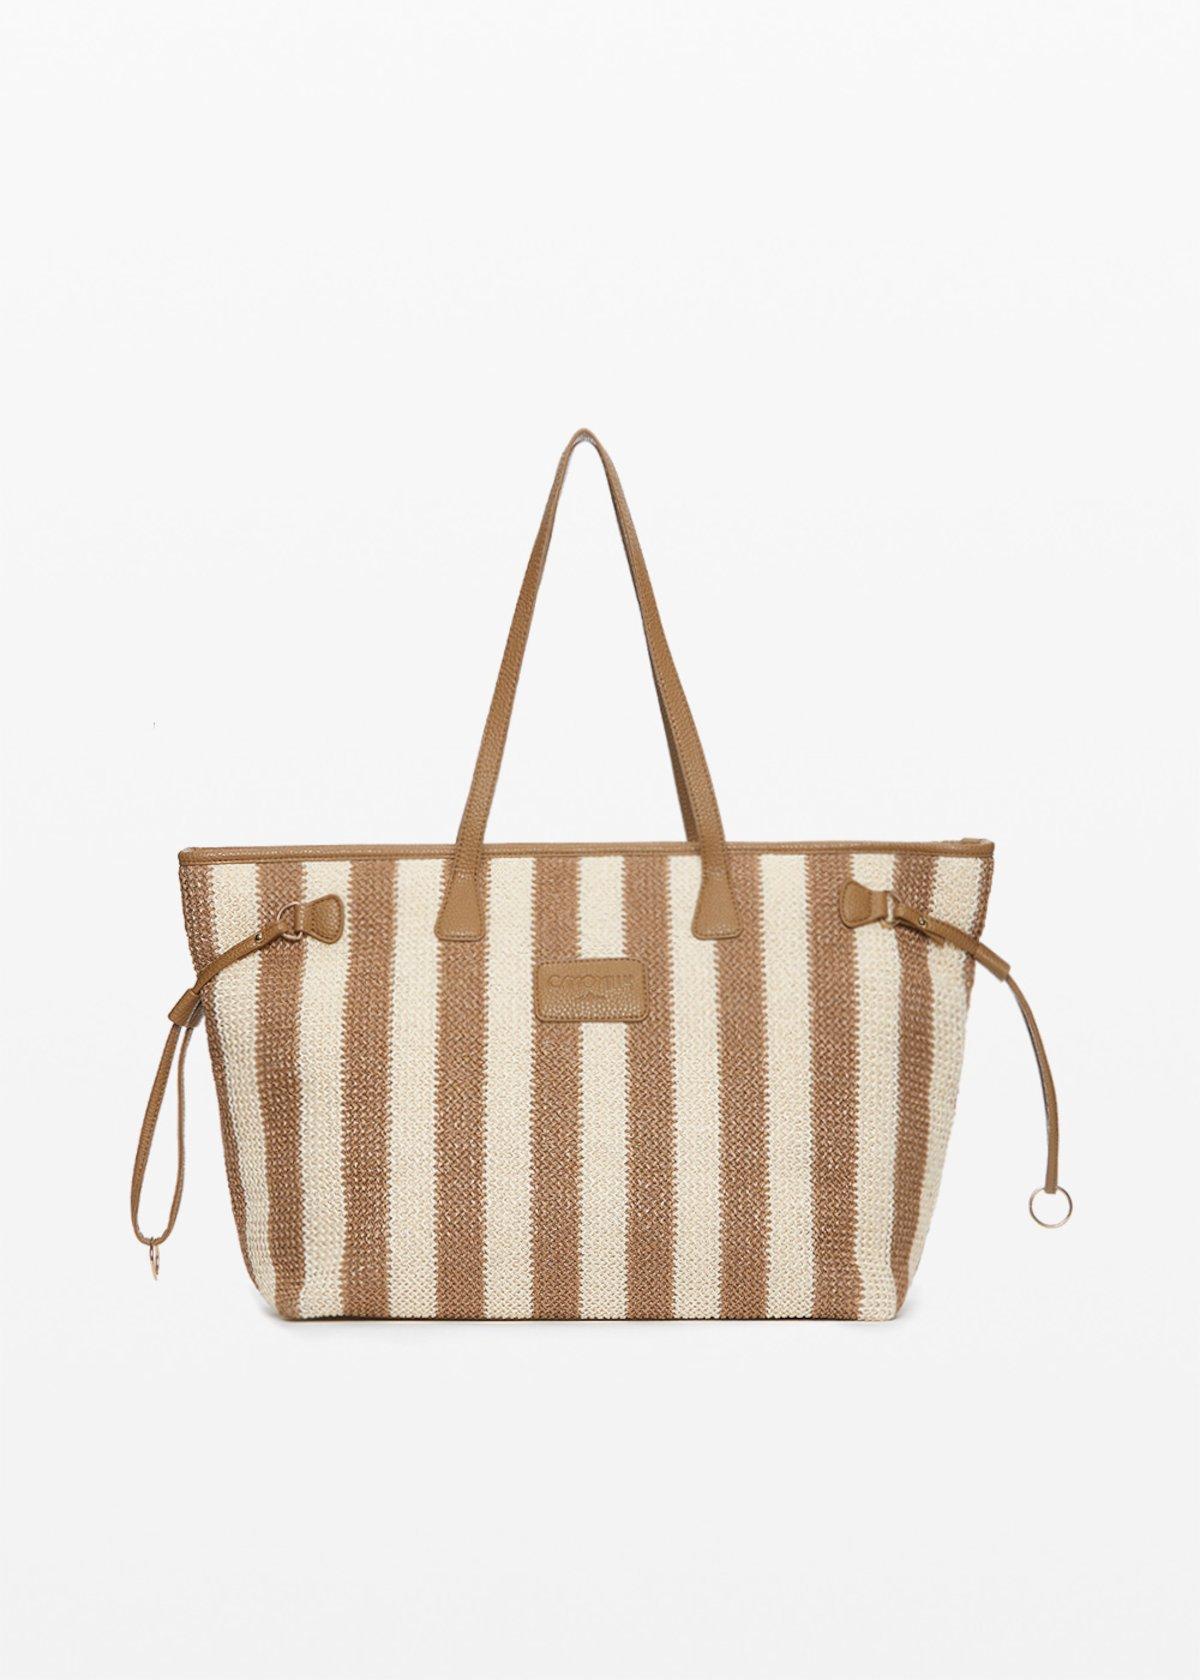 Raffia Nelly Shopping bag stripes fantasy - Desert / White Stripes - Woman